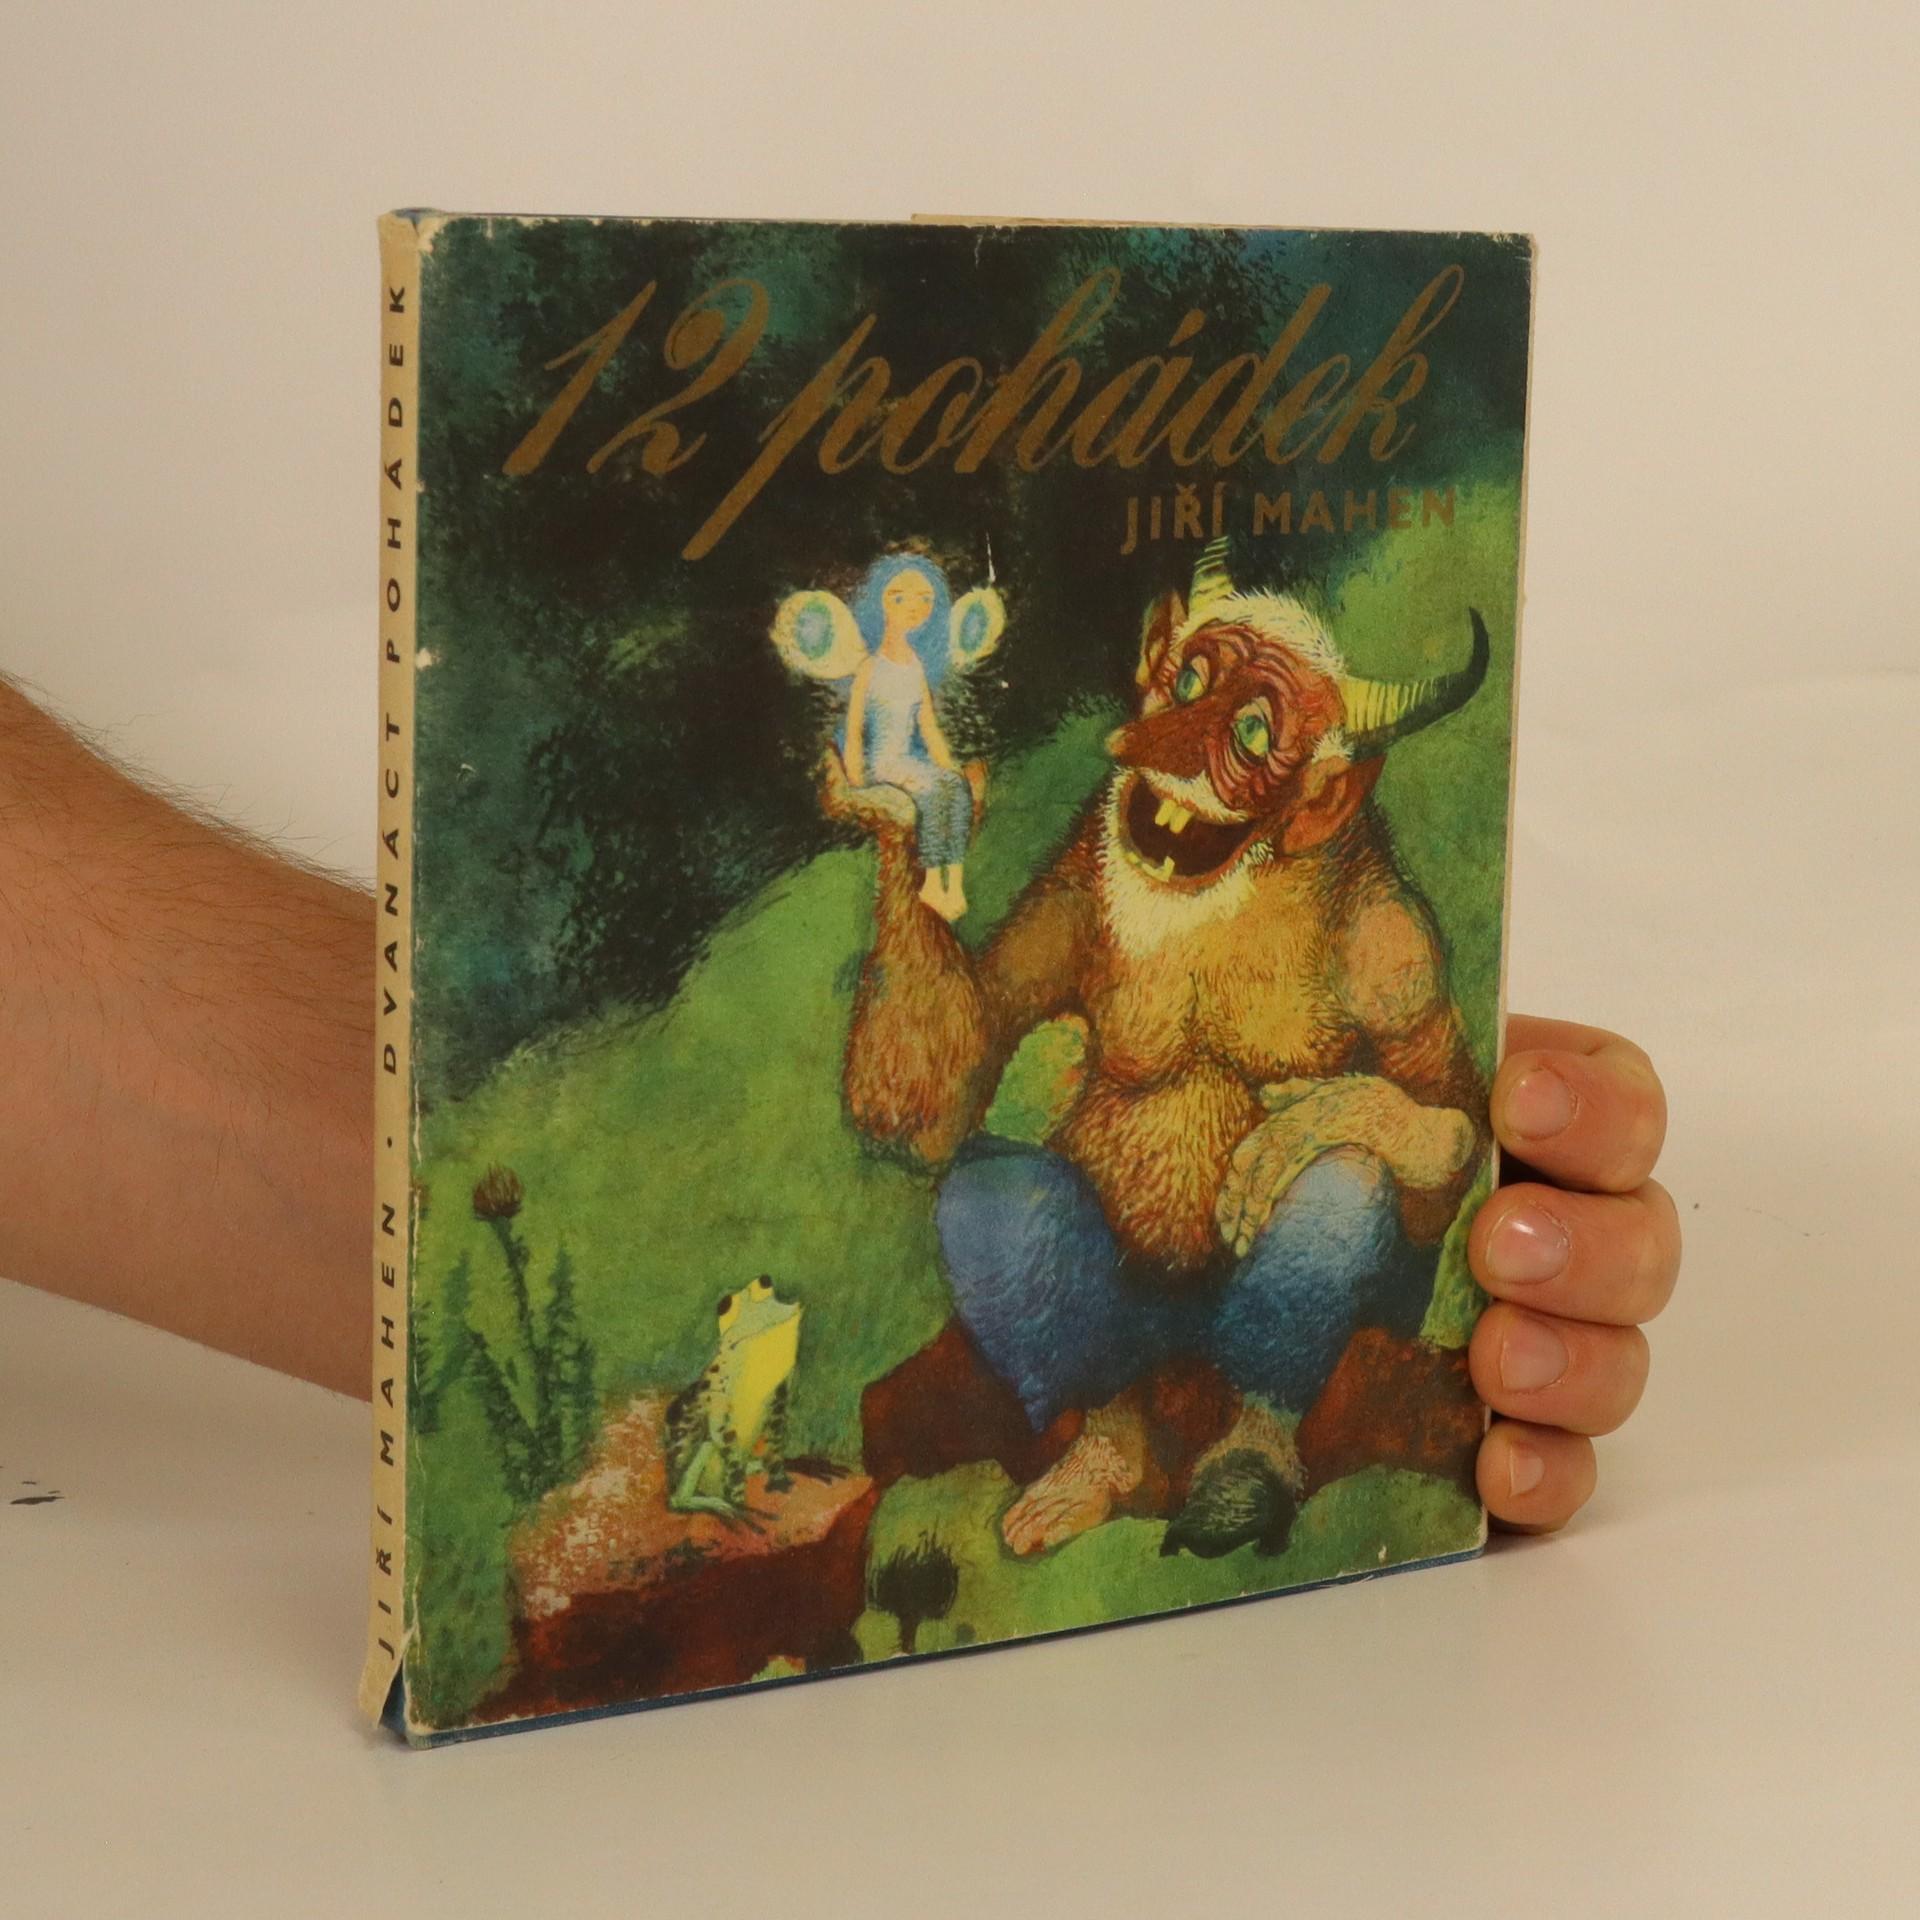 antikvární kniha Dvanáct pohádek, 1969